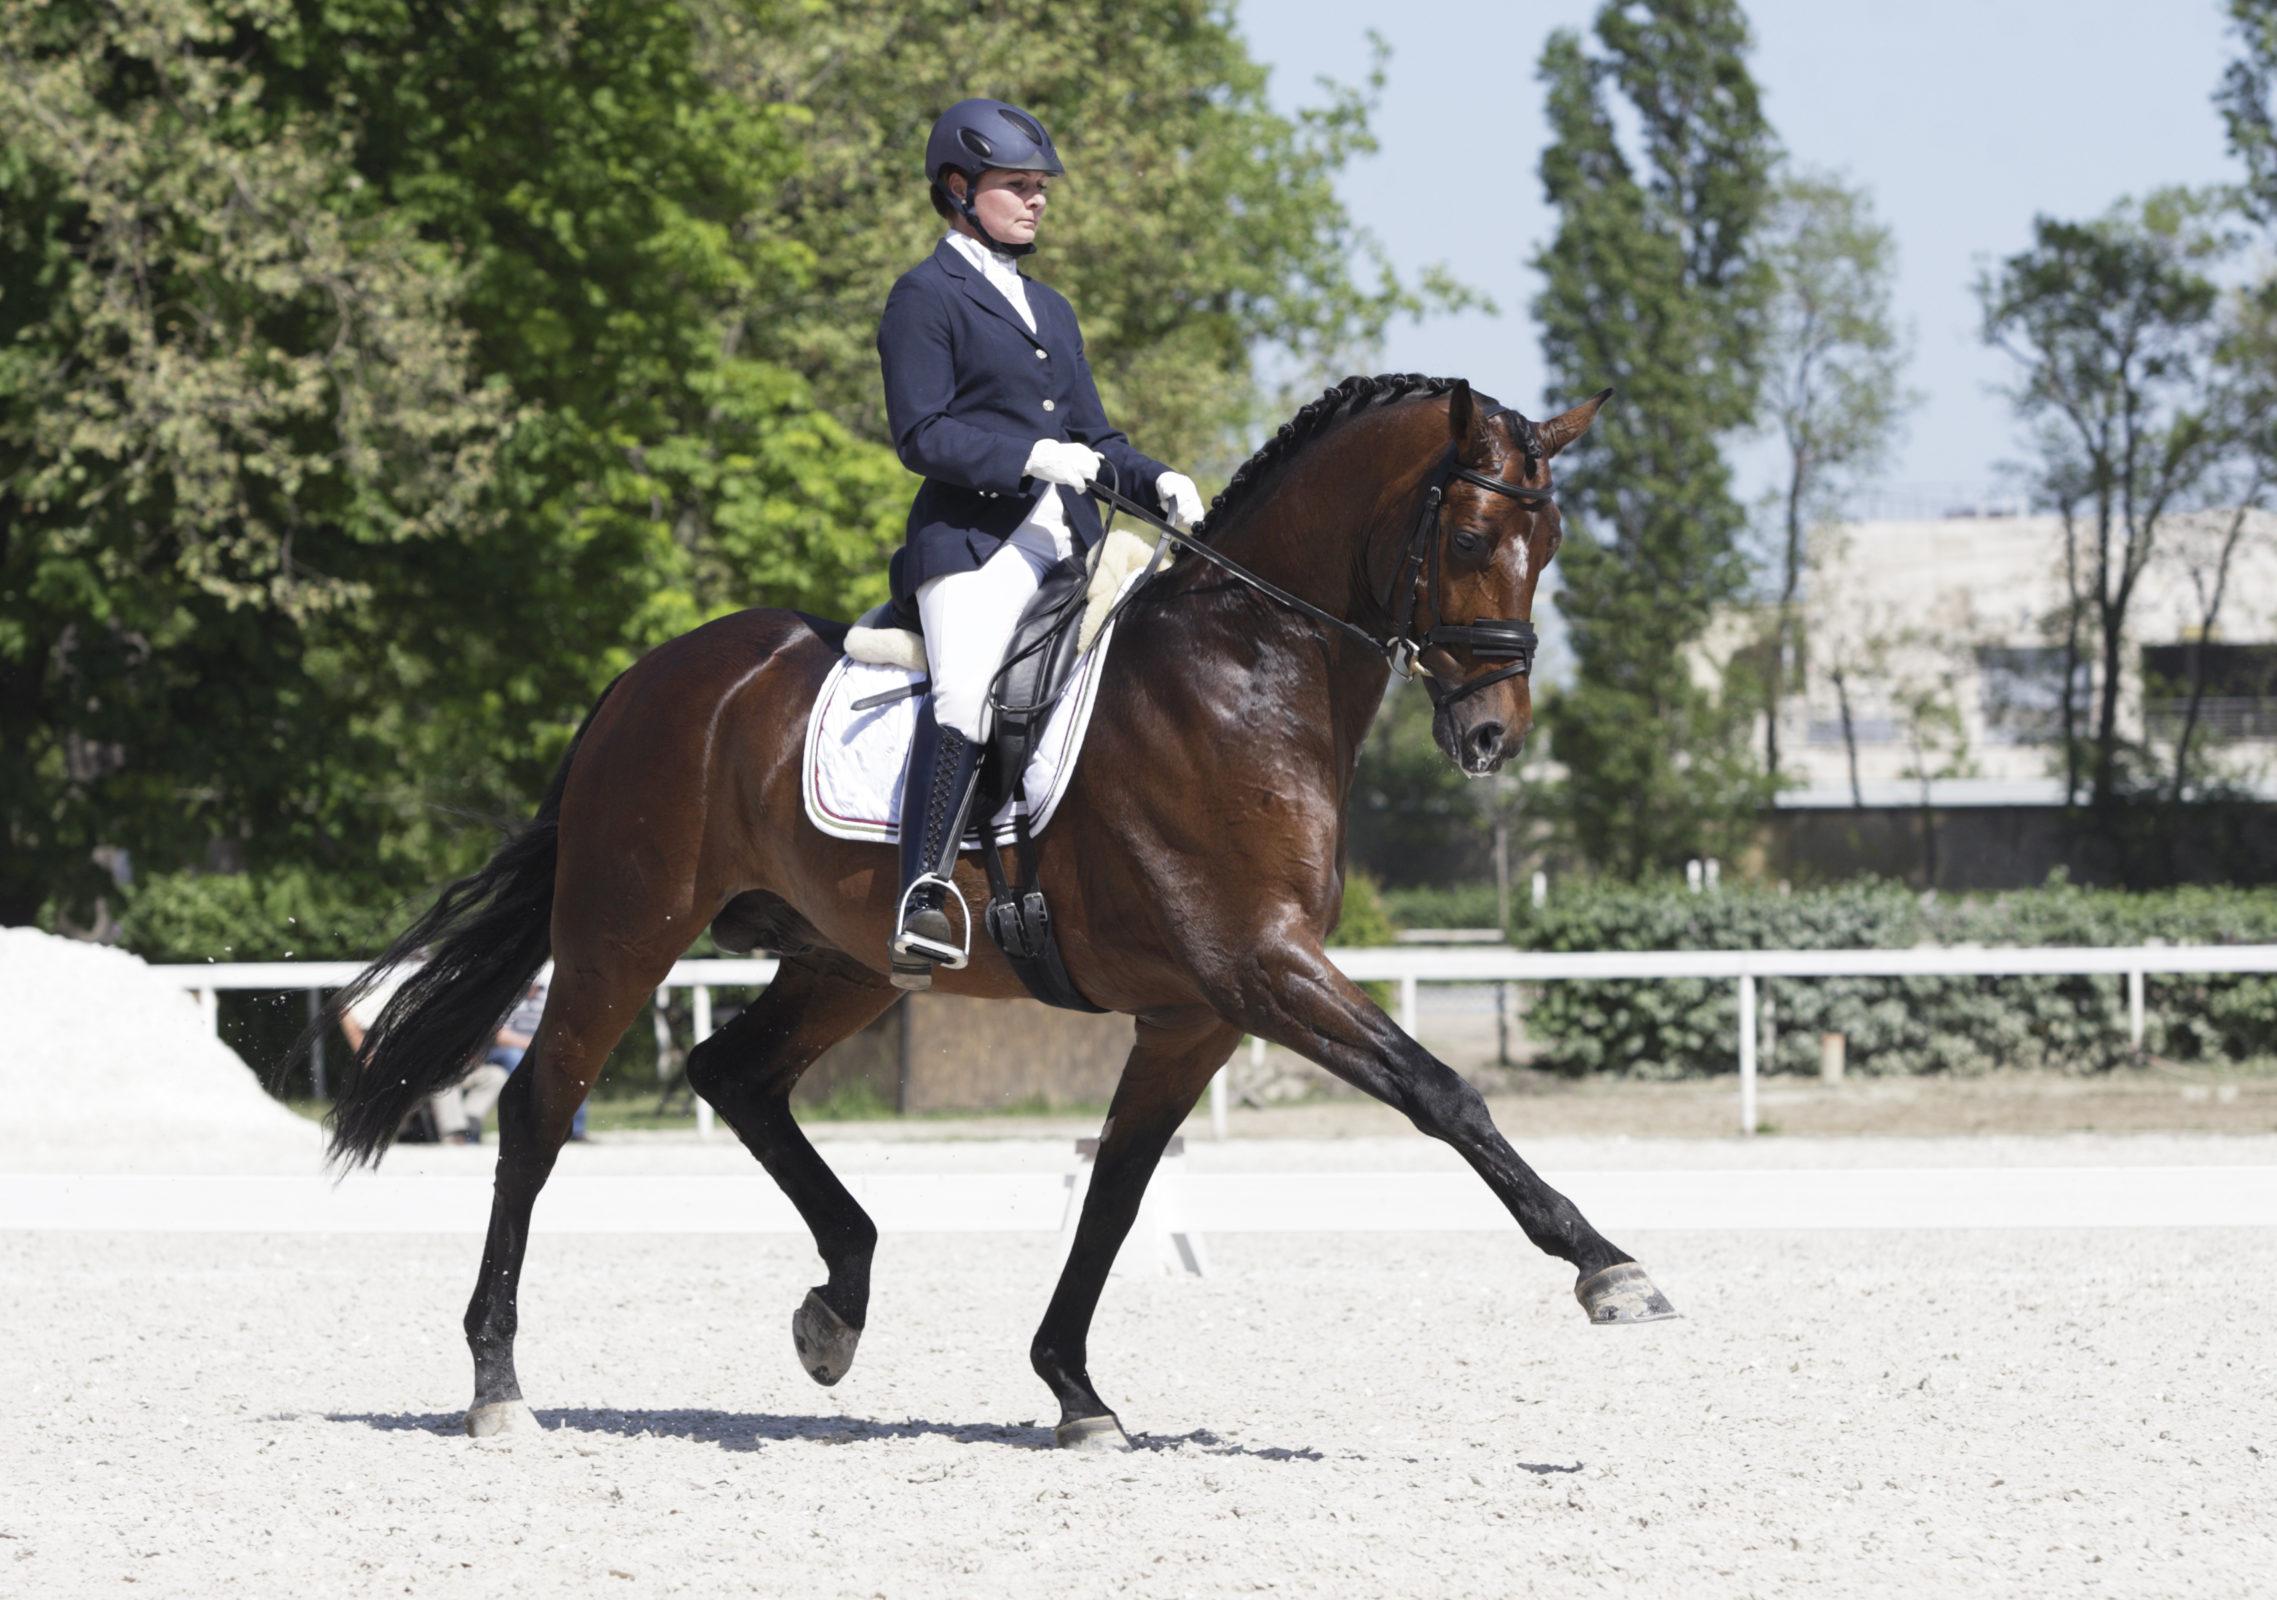 Mel Equine, muscular equine locomotion, Emmett therapy, equine massage, horse massage, melanie harris, maitland